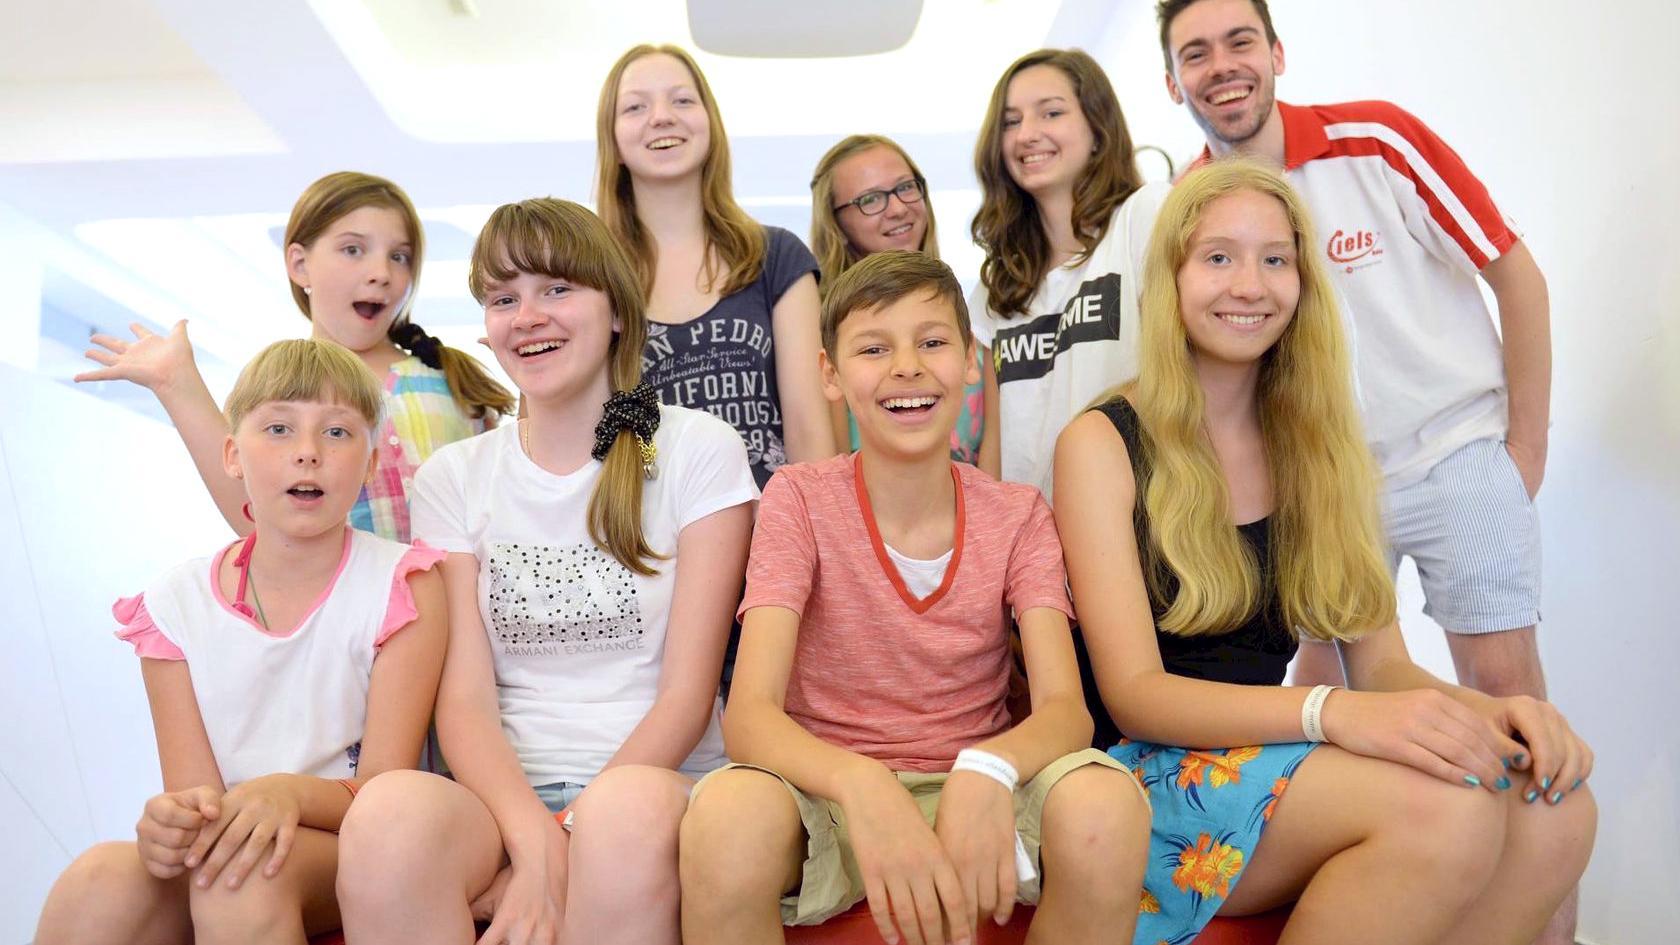 IELS Malta - Summer Camp для детей 8-12 лет